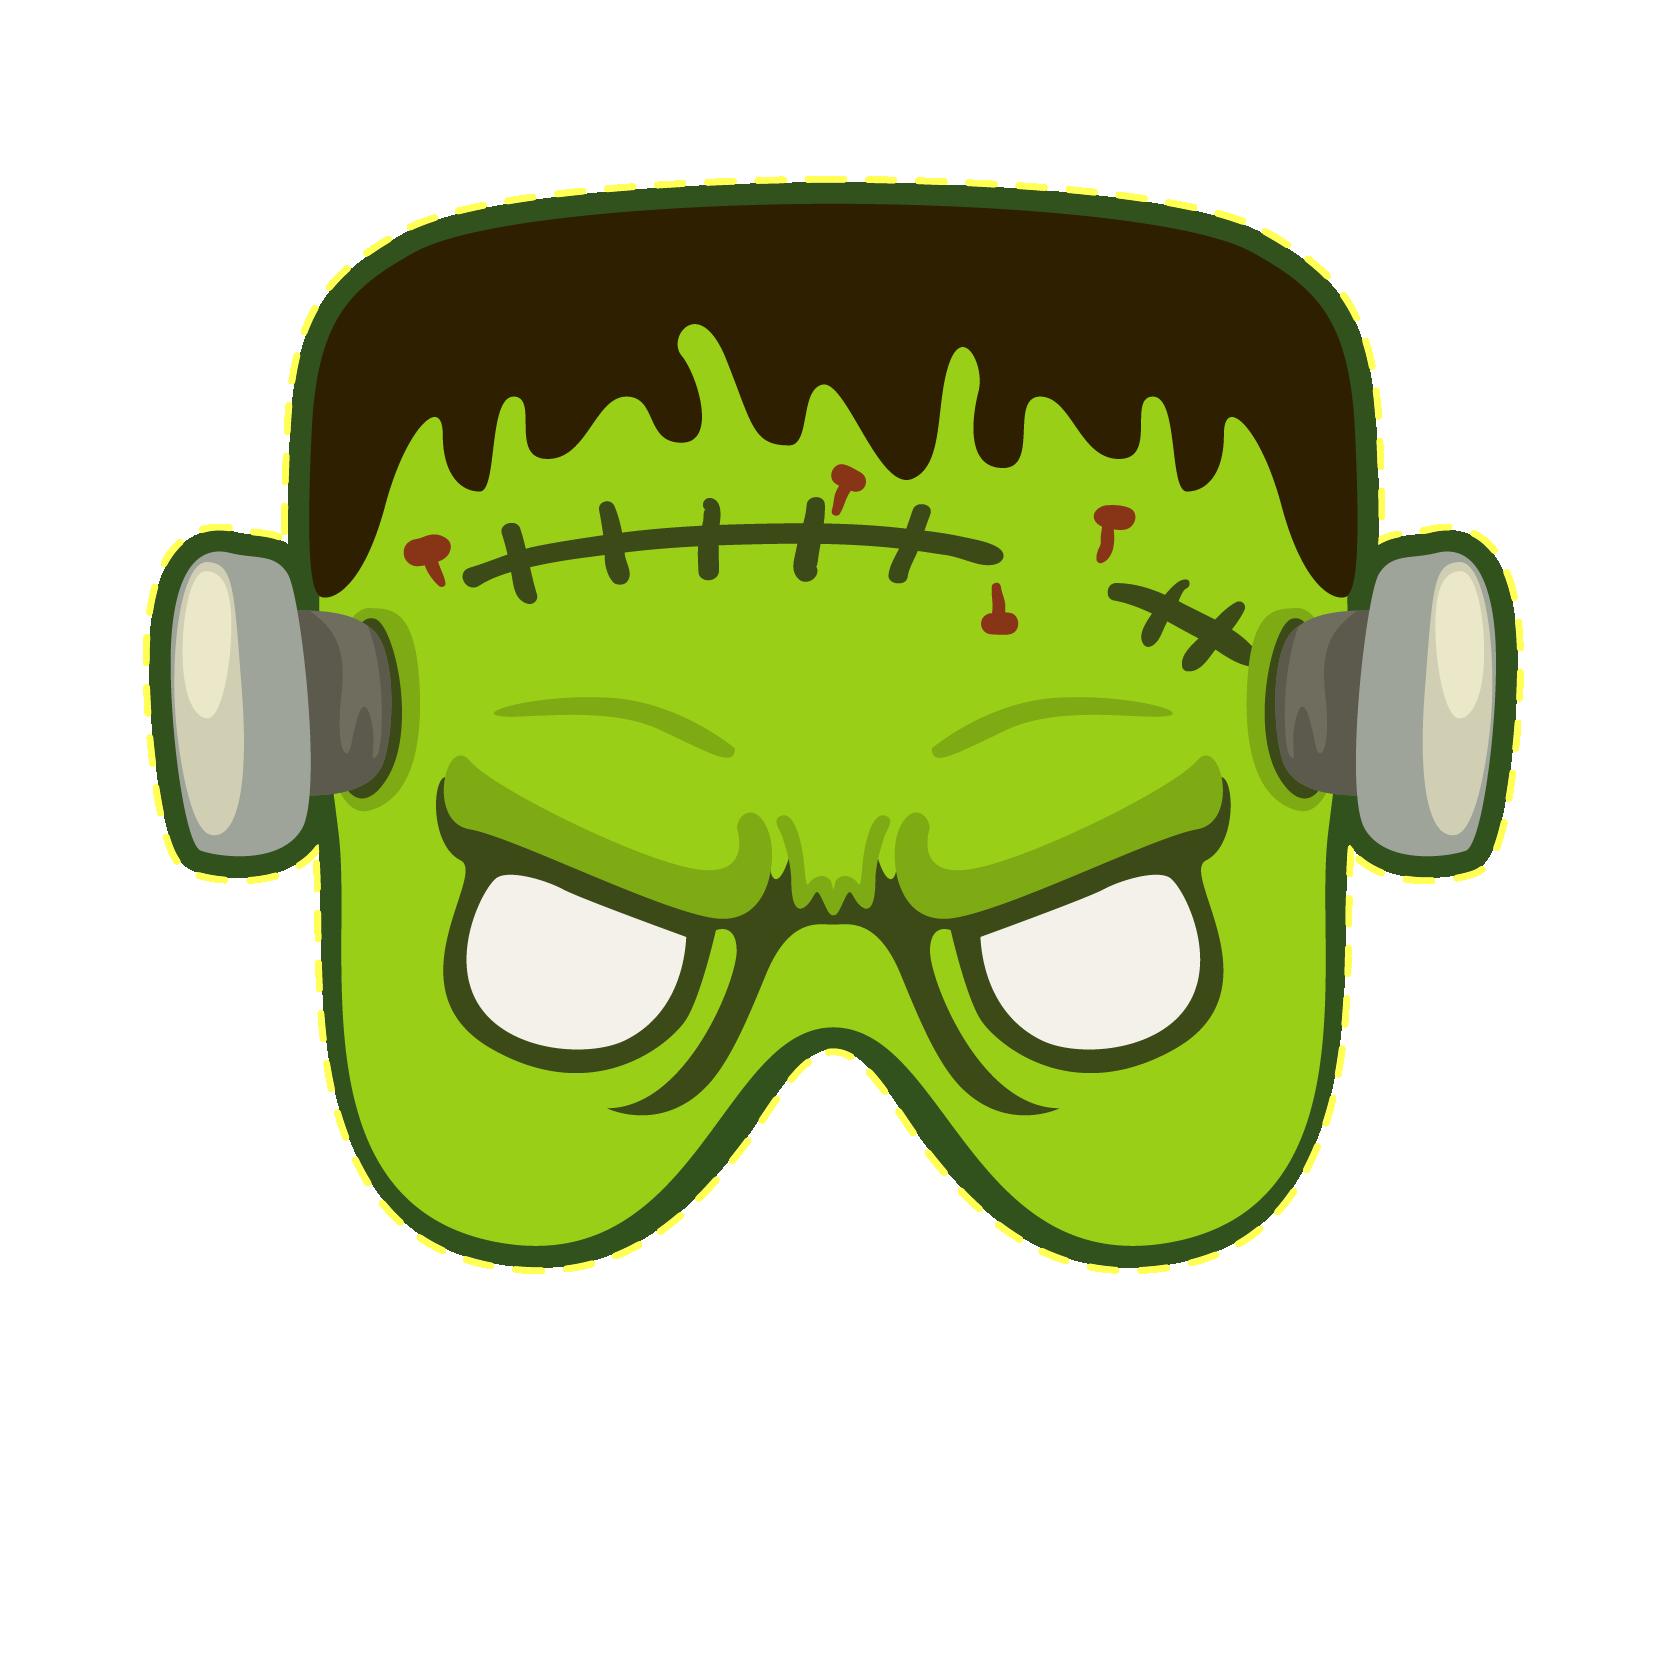 Frankensteins monster mask. Clipart halloween frankenstein